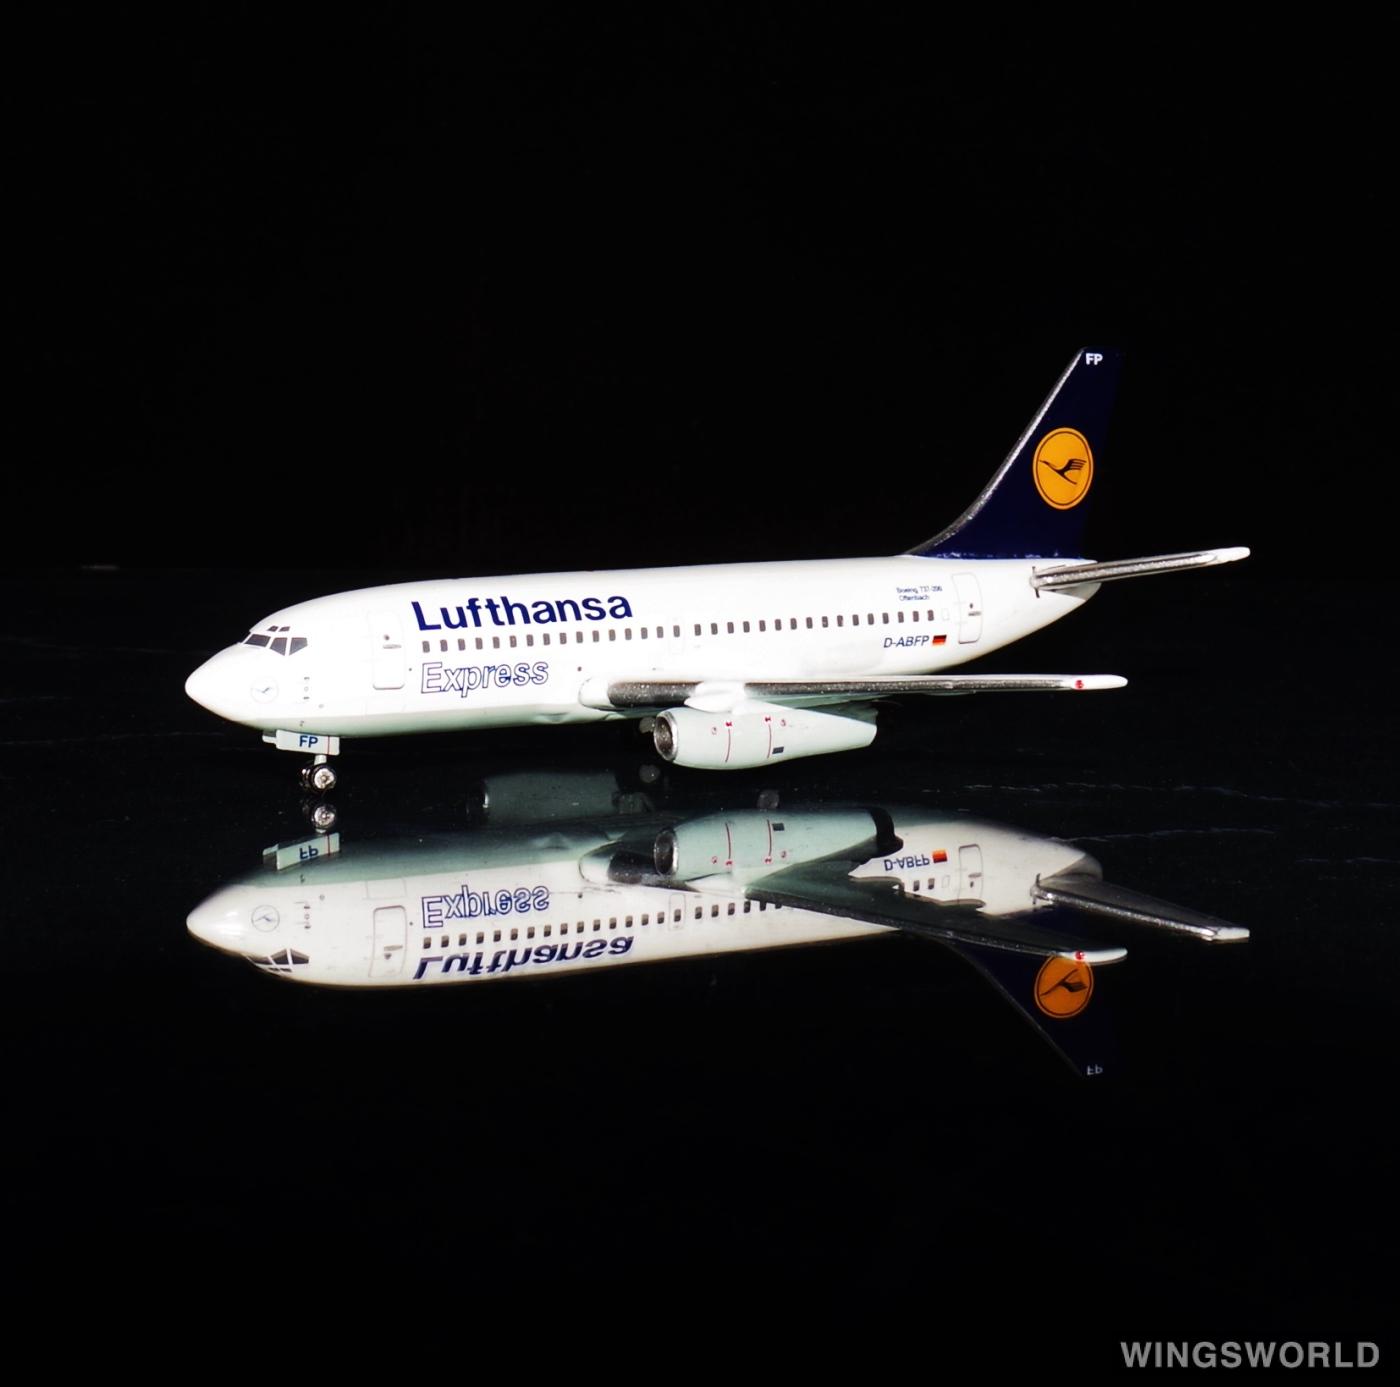 JC Wings 1:400 XX4803 Lufthansa 汉莎航空 Boeing 737-200 D-ABFP